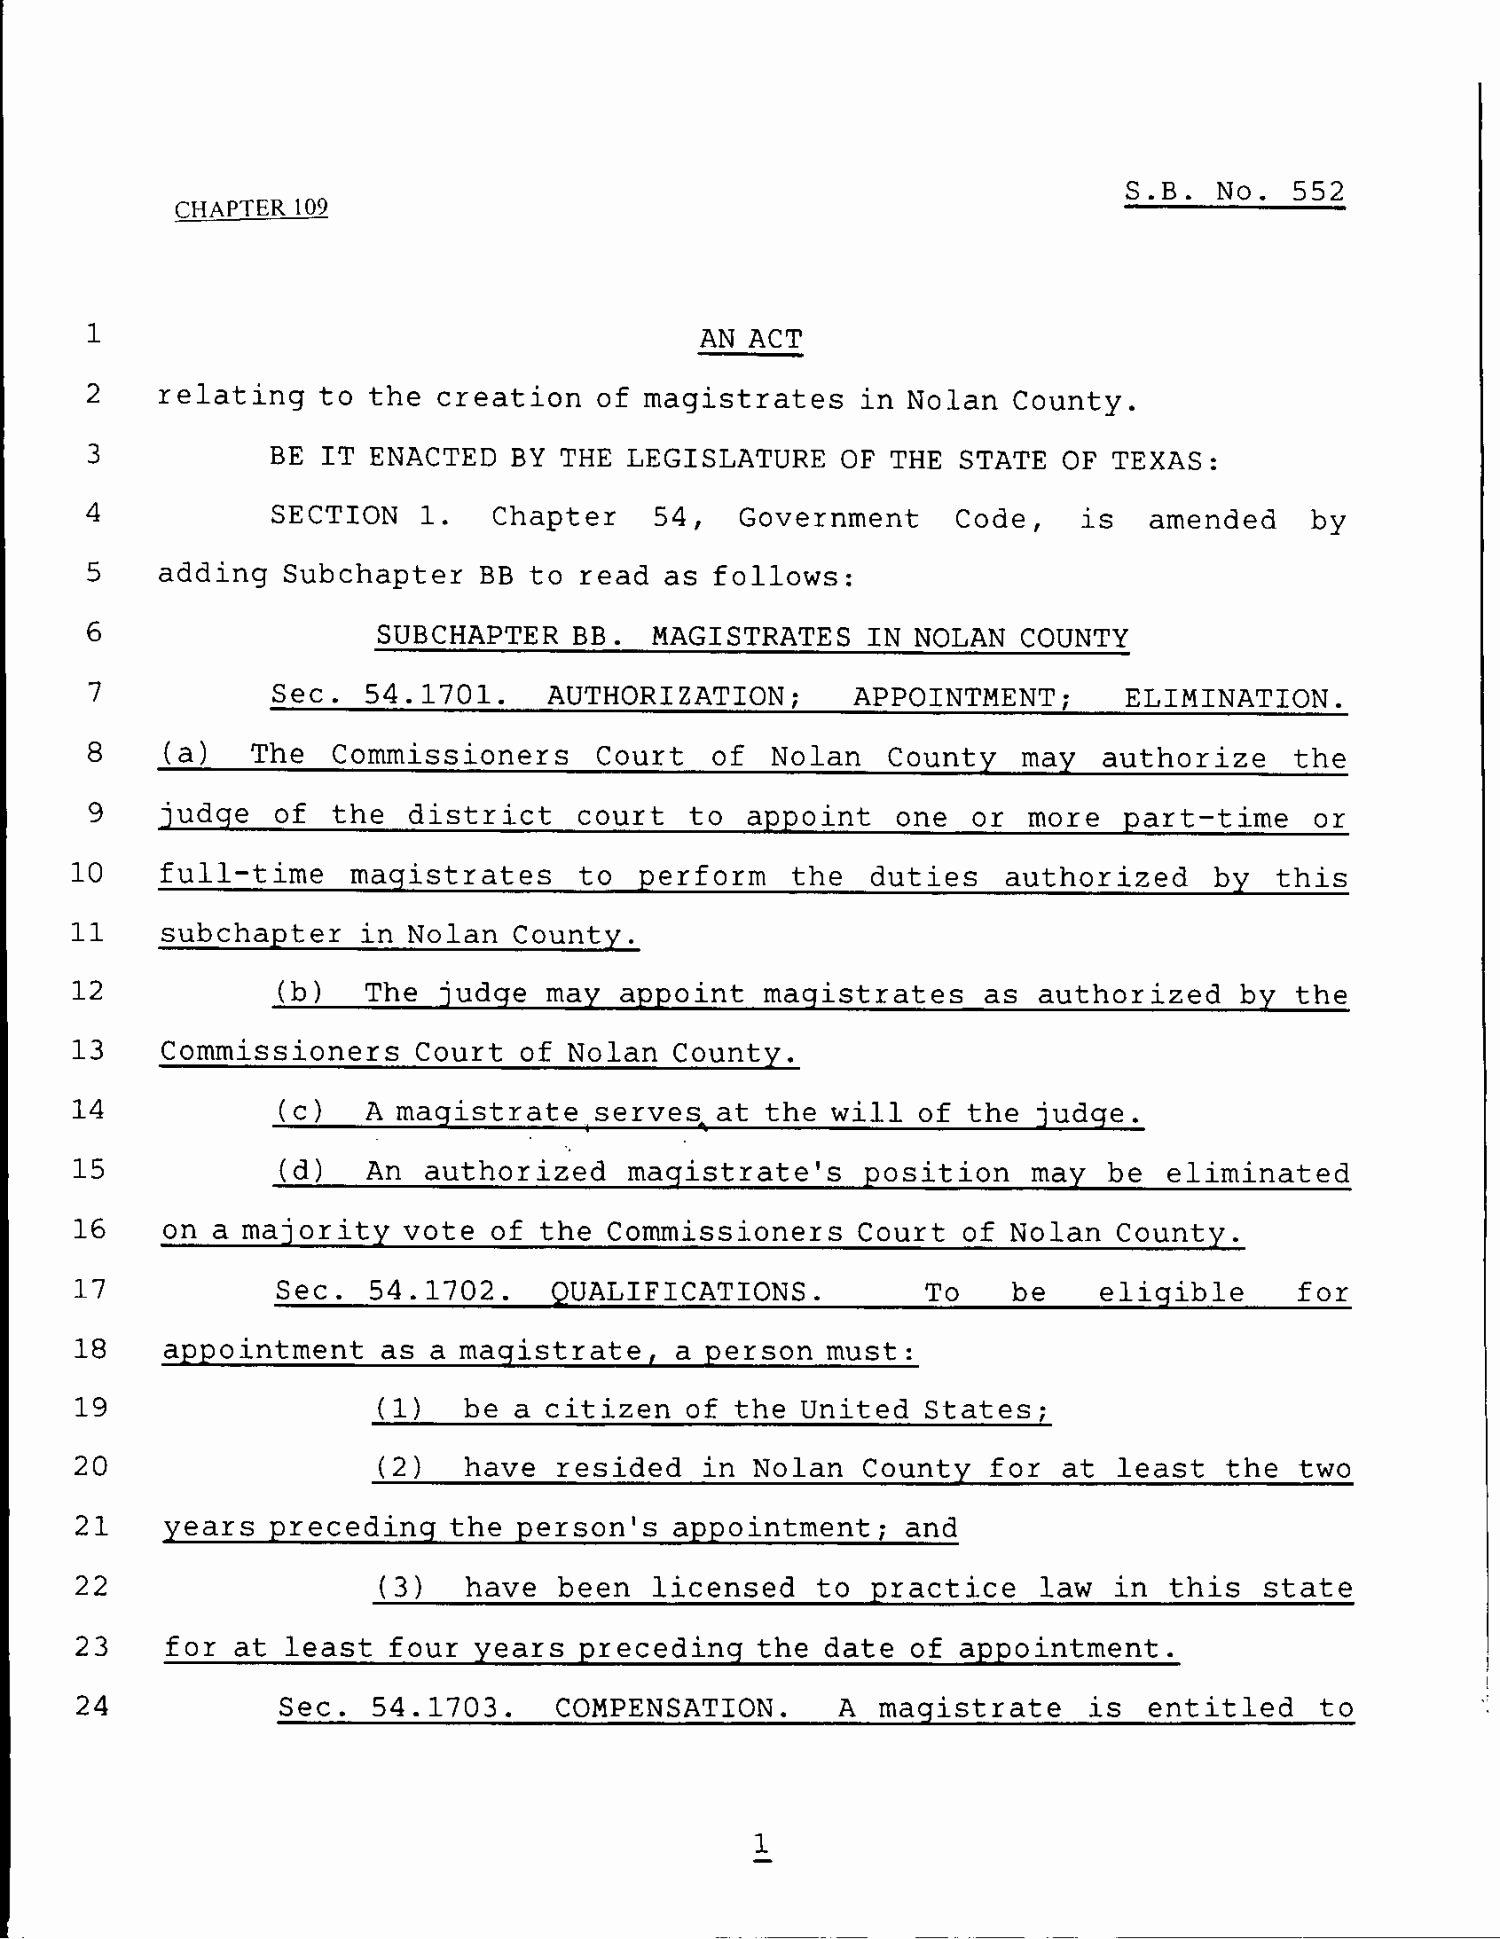 Congressional Bill Template Awesome 79th Texas Legislature Regular Session Senate Bill 552